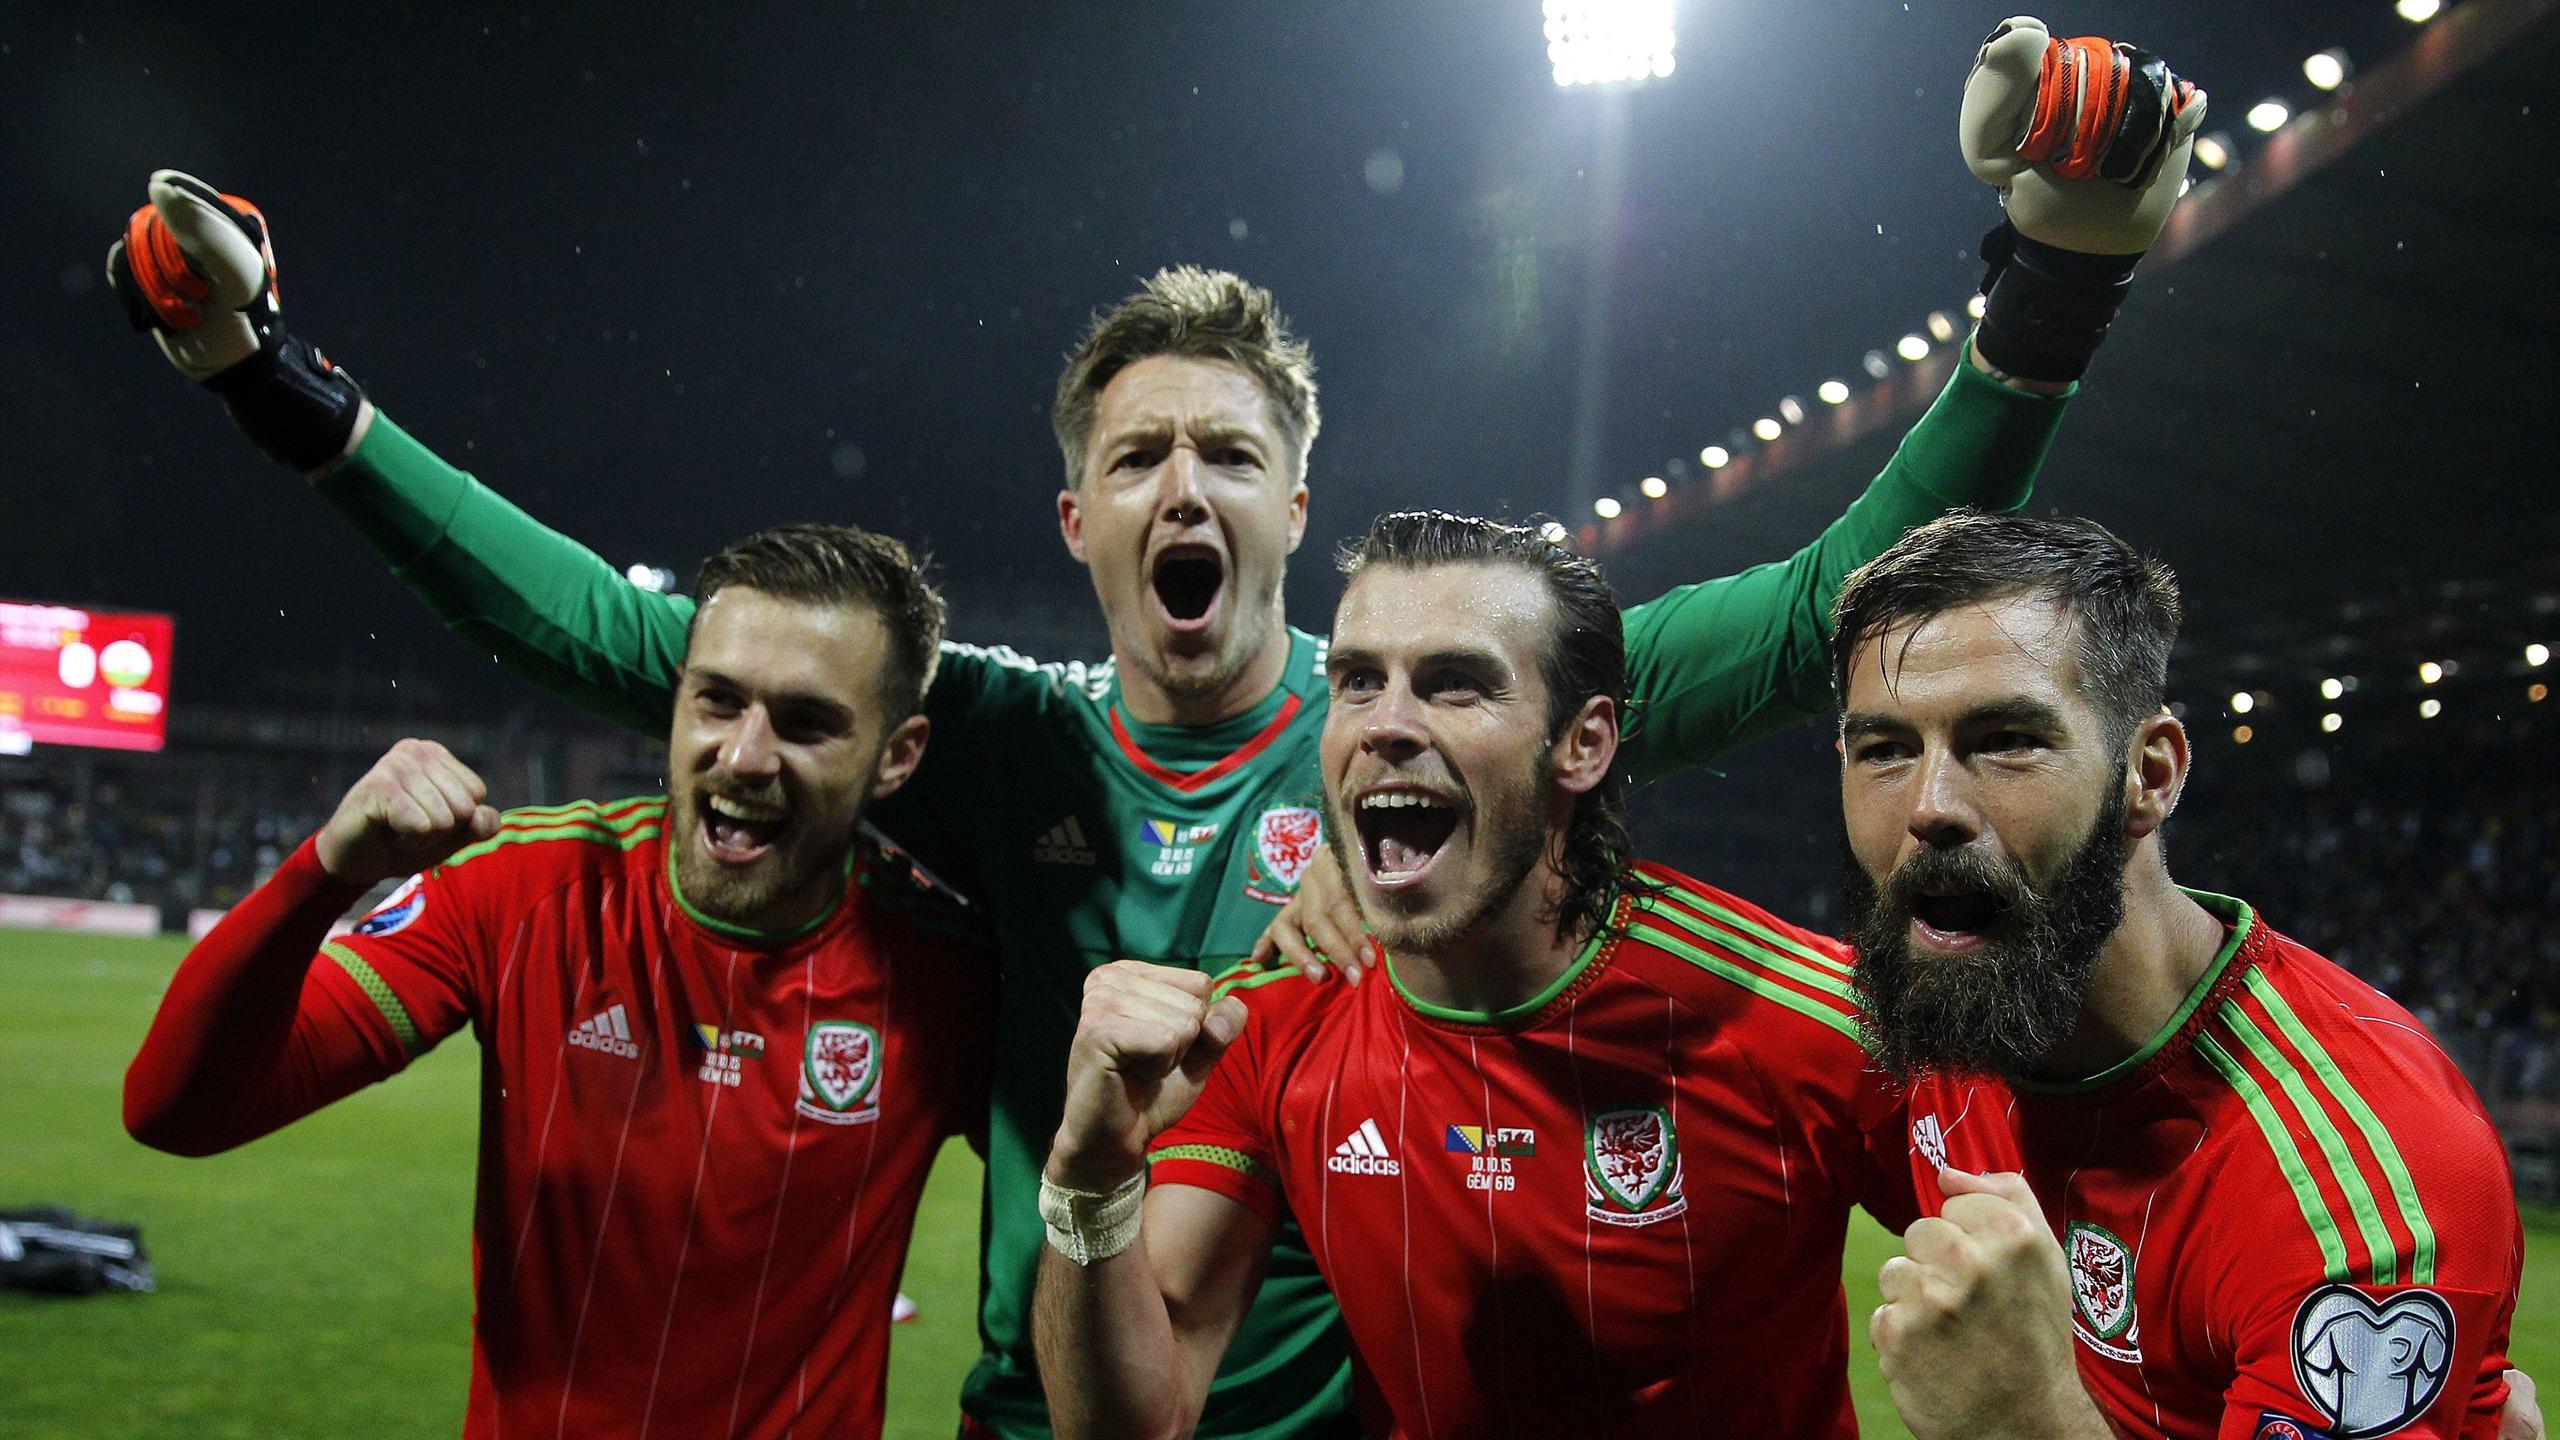 Wales feiert seine erste EM-Teilnahme